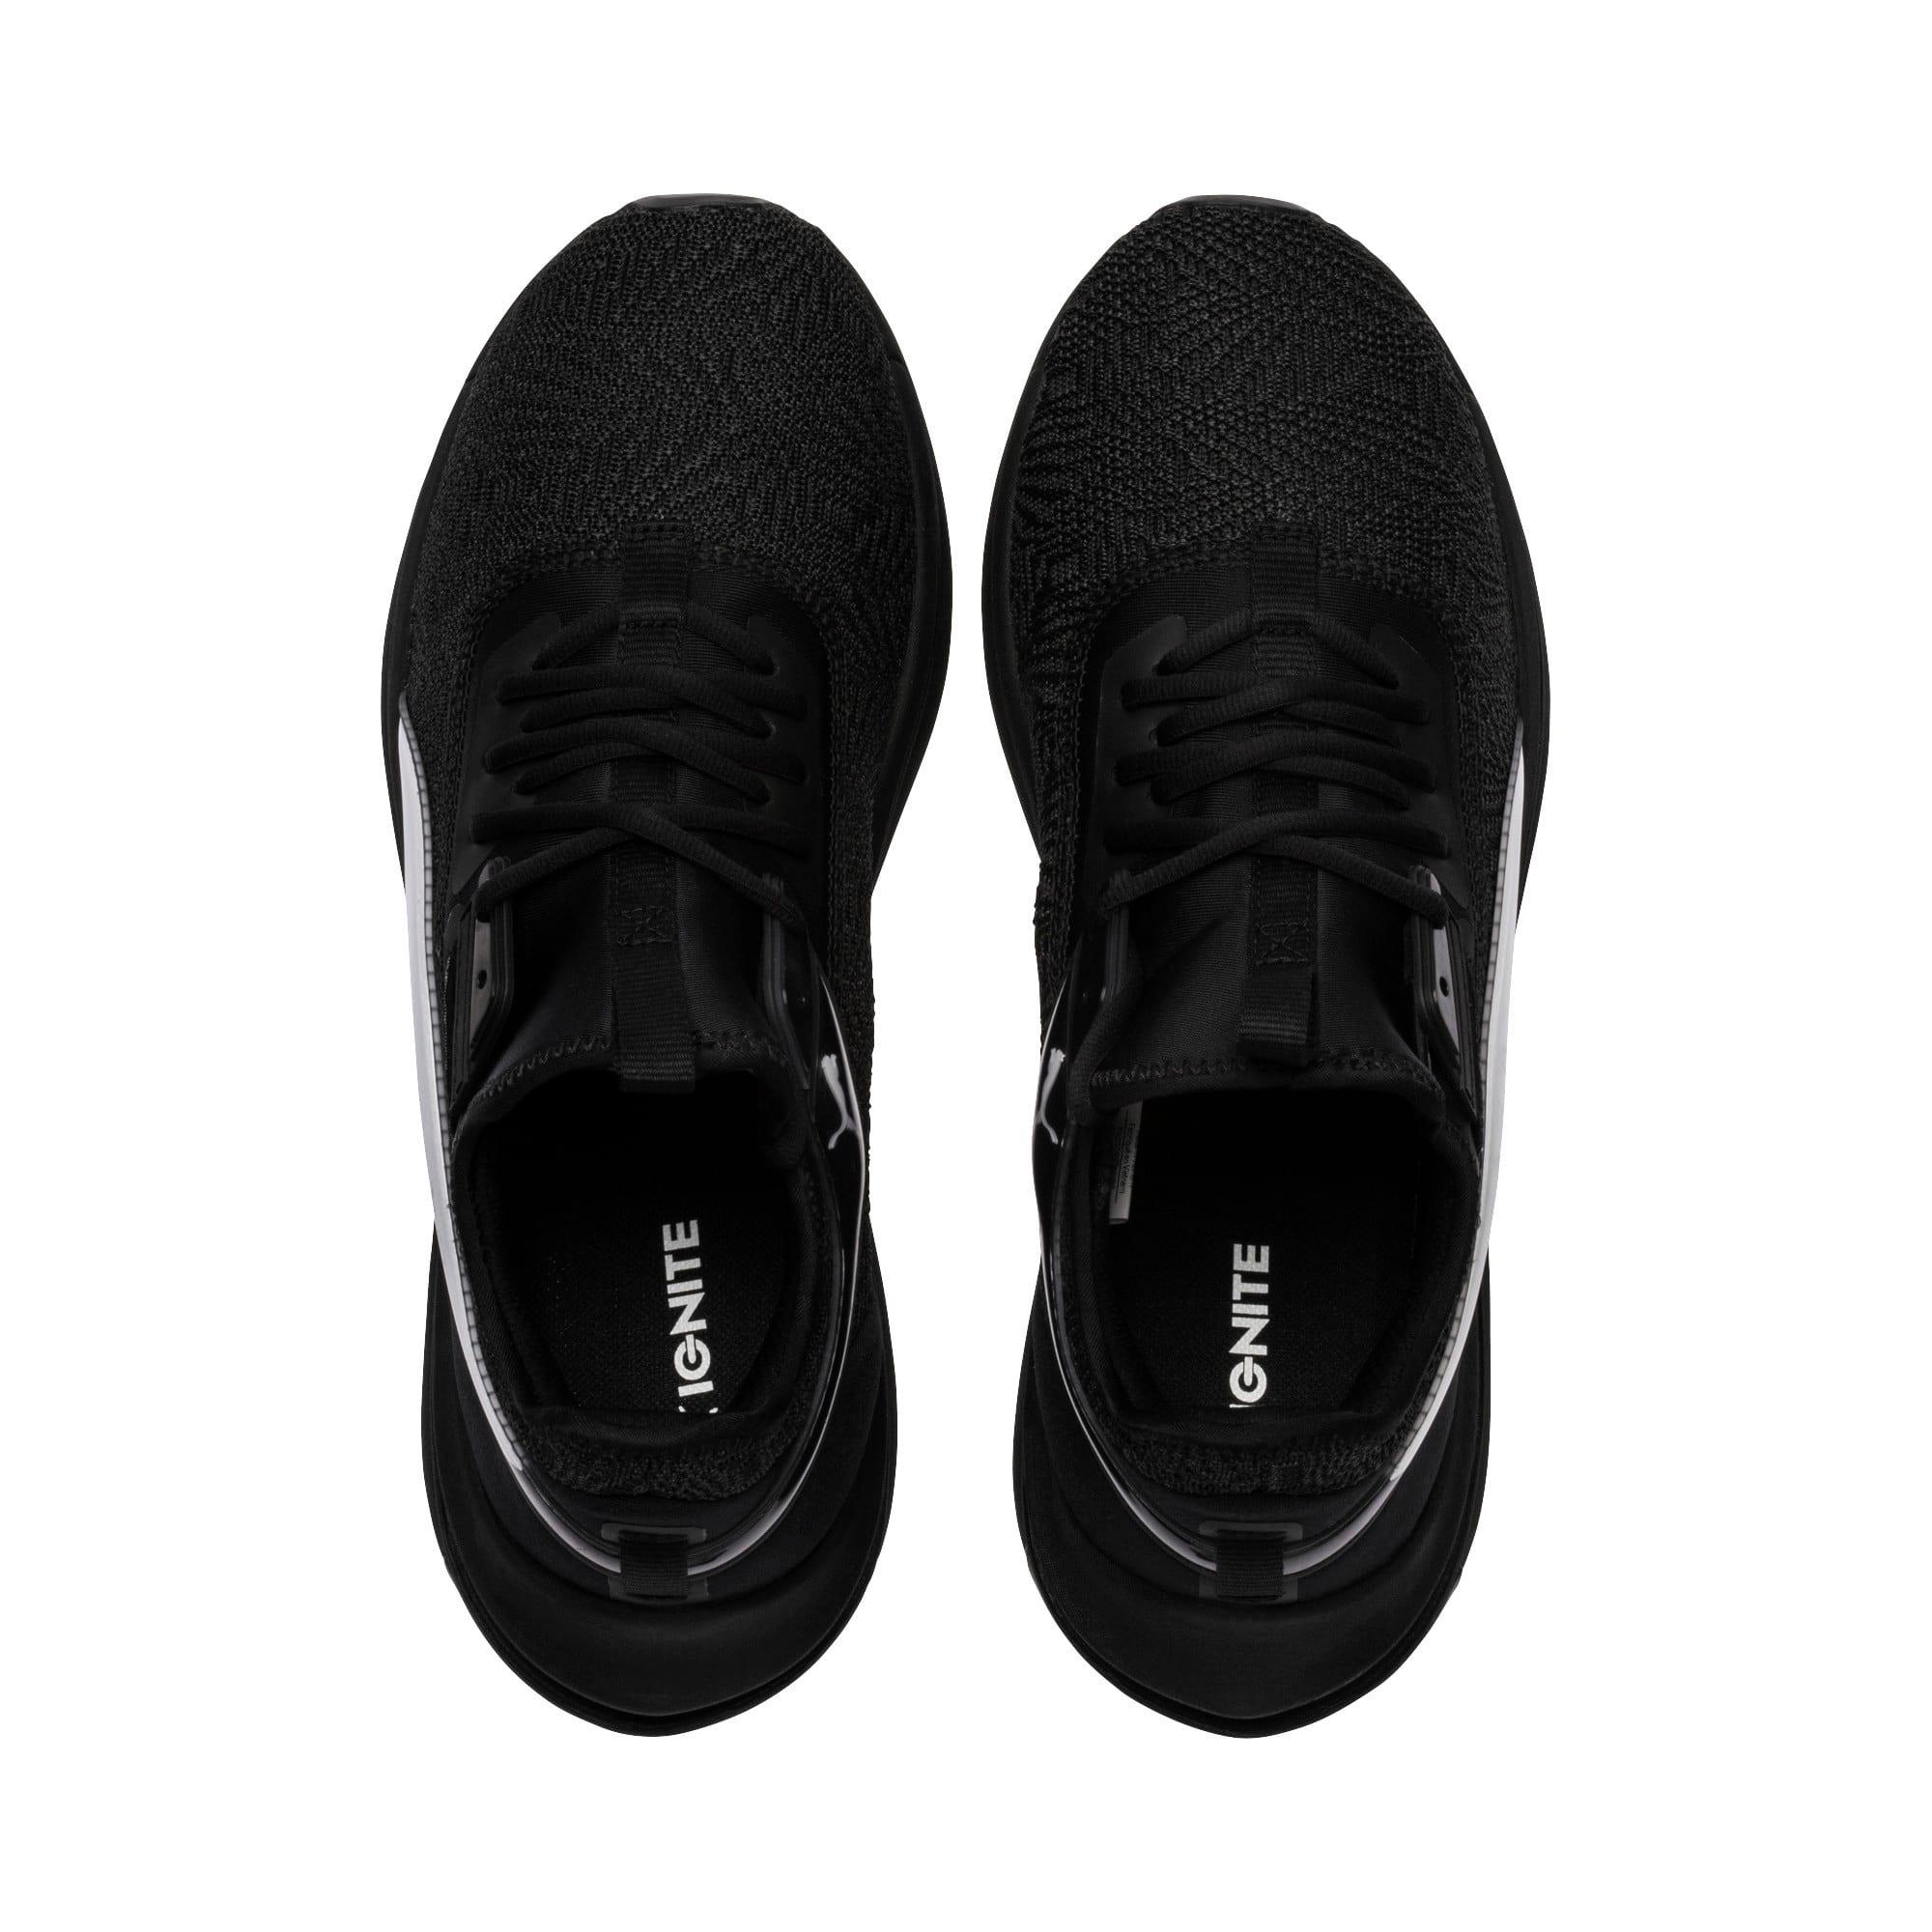 Thumbnail 6 of IGNITE Limitless SR-71 Running Shoes, Puma Black, medium